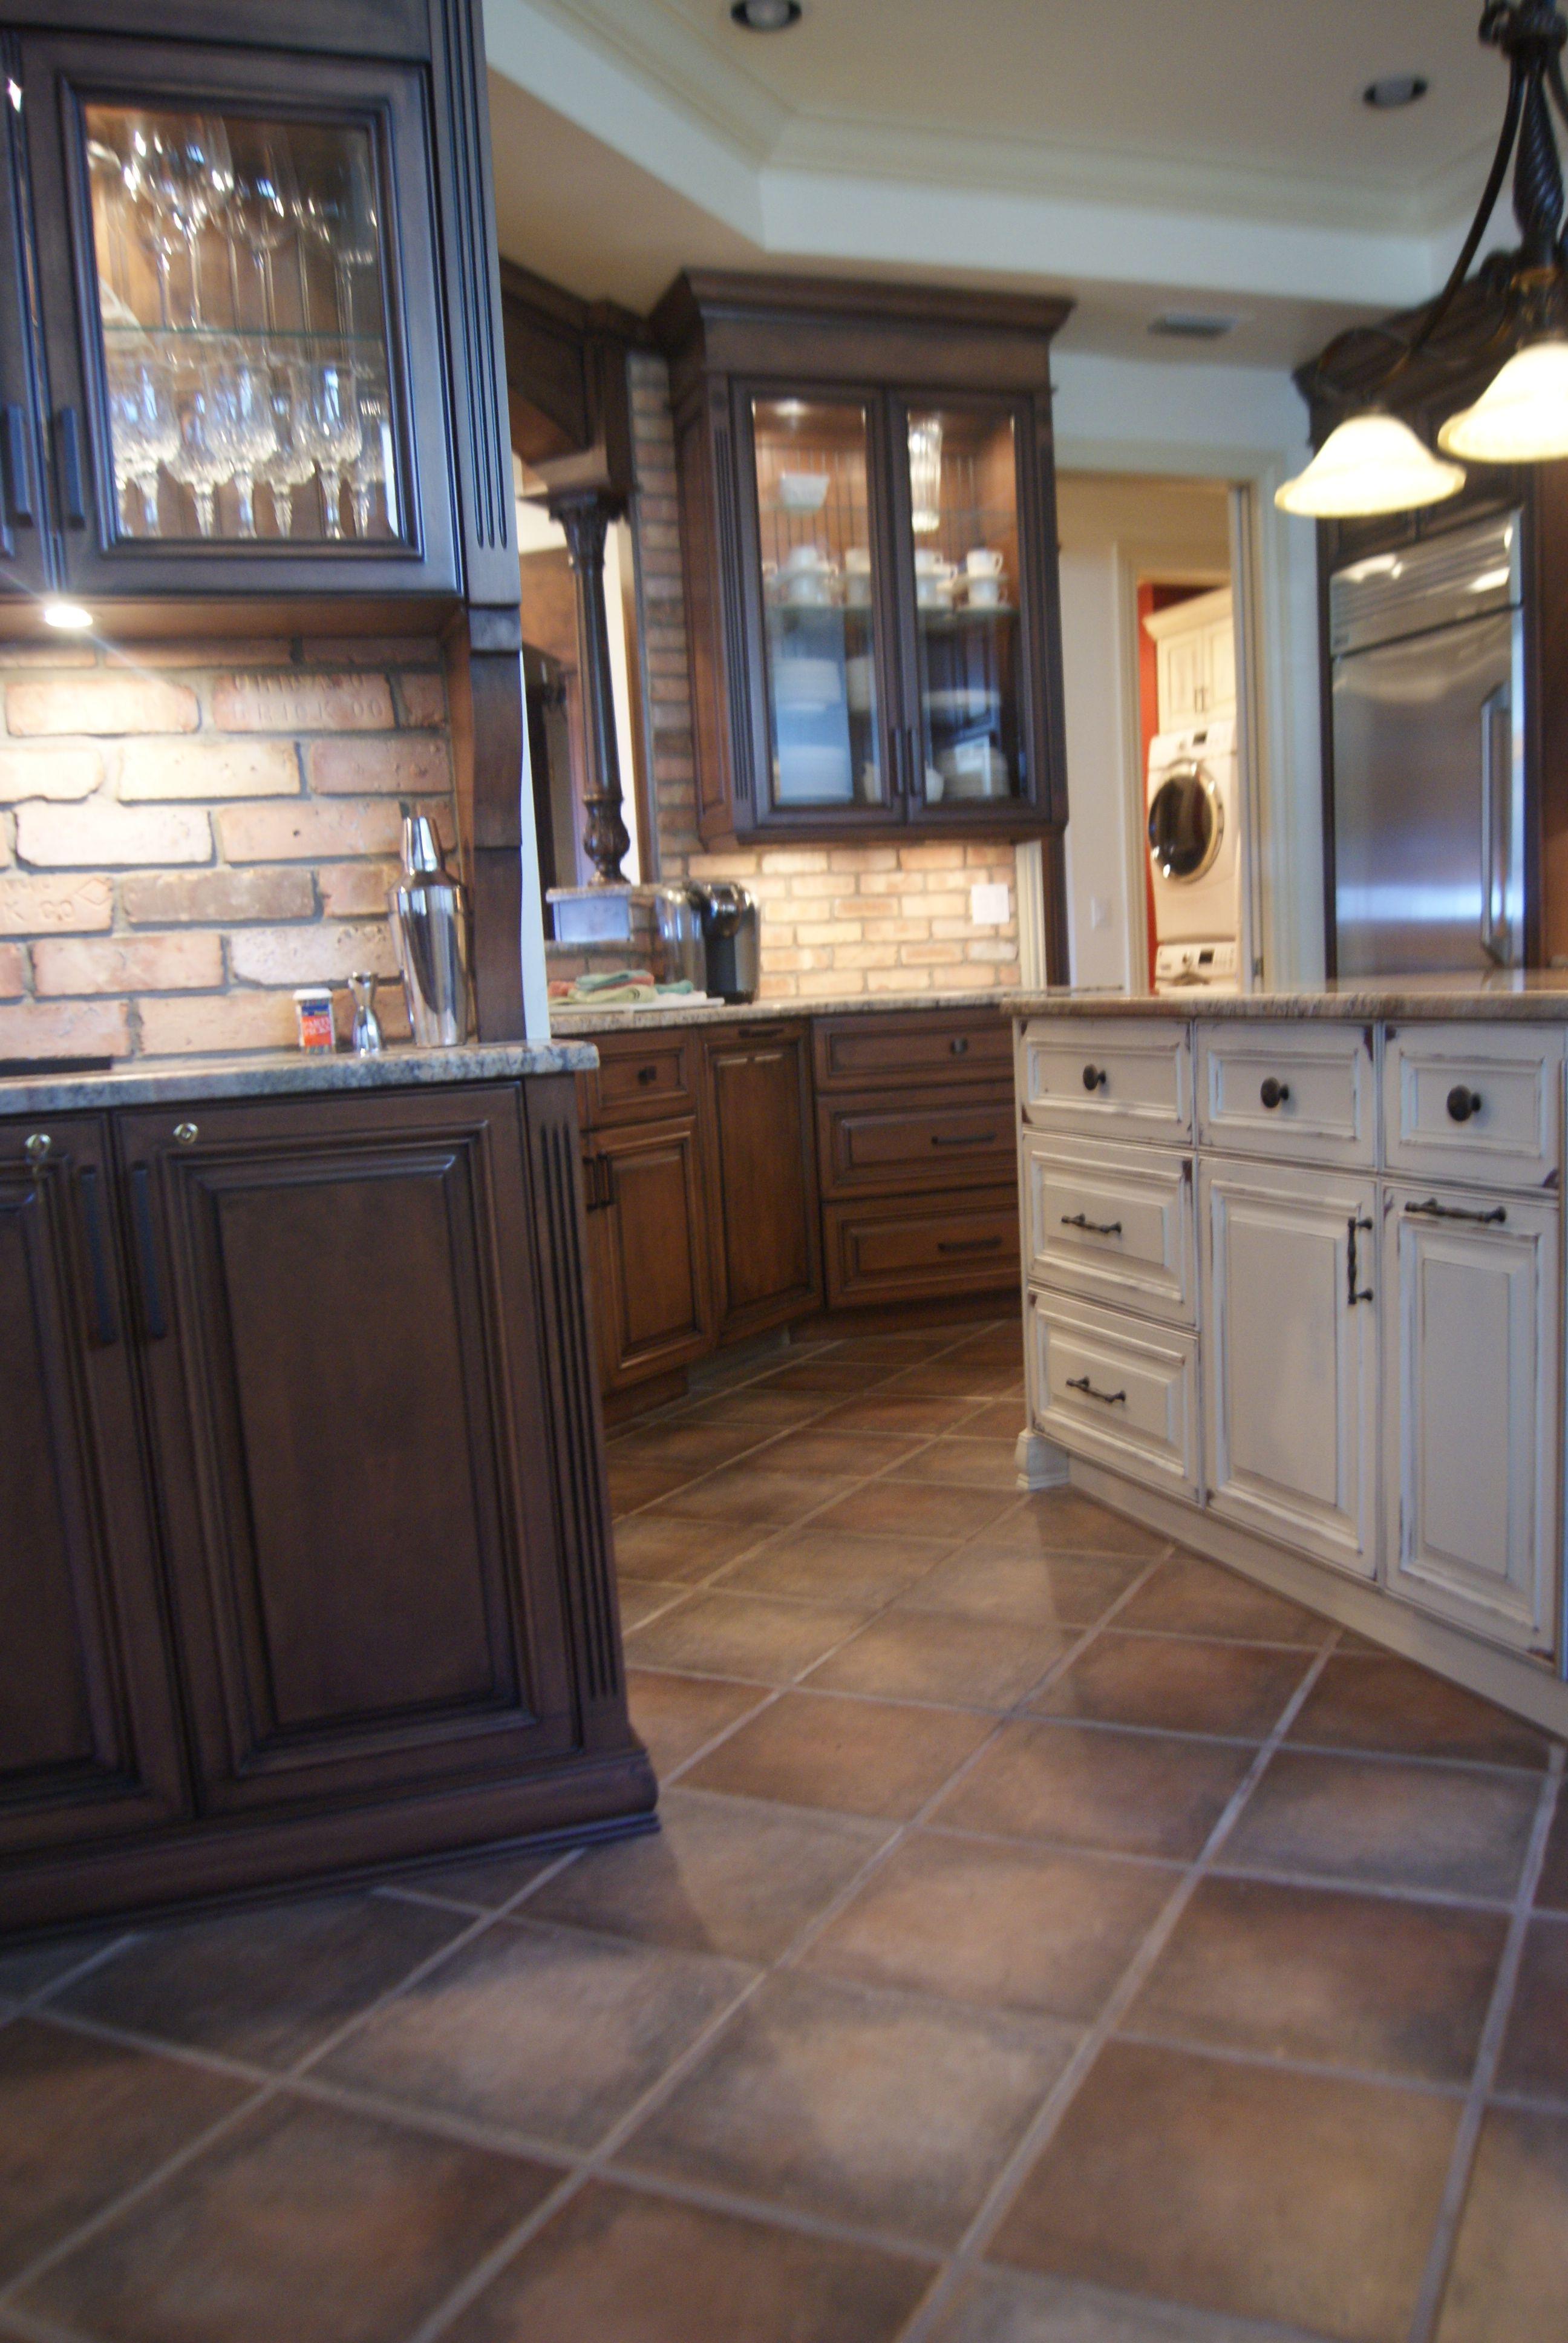 mediterranean inspired kitchen brick back splash terracotta tile floors designed and built by on kitchen remodel floor id=74596